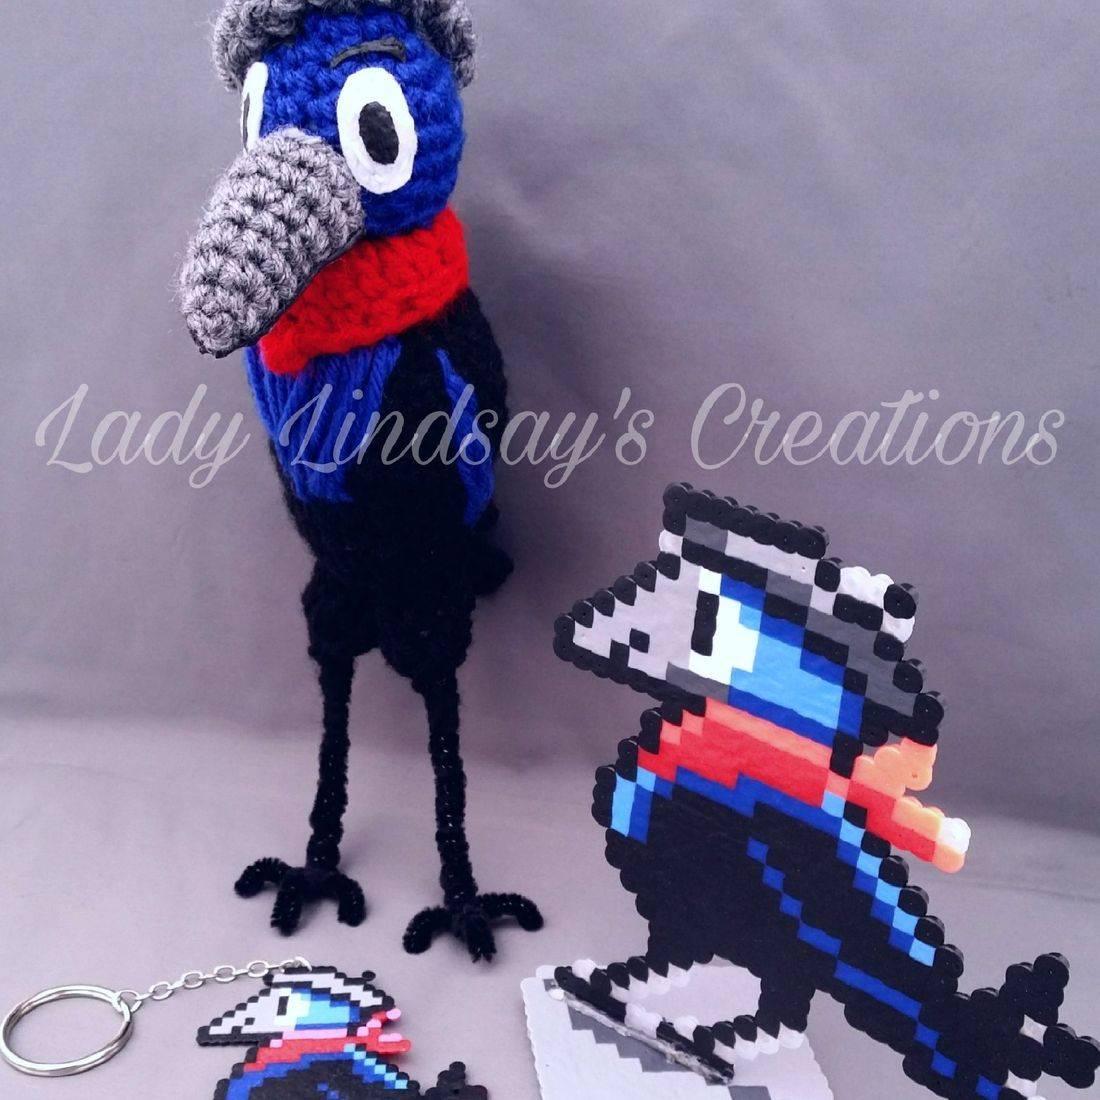 AHO, Malikali Shabazz, Art of Malikai Shabazz, Shabazz, Art, Artie, Bird, Amigurumi, plush, doll, keychain, pixel, pixel art, pixel sprite, handmade, craft, fiber art, shop small, nerd, geek, otaku, kawaii